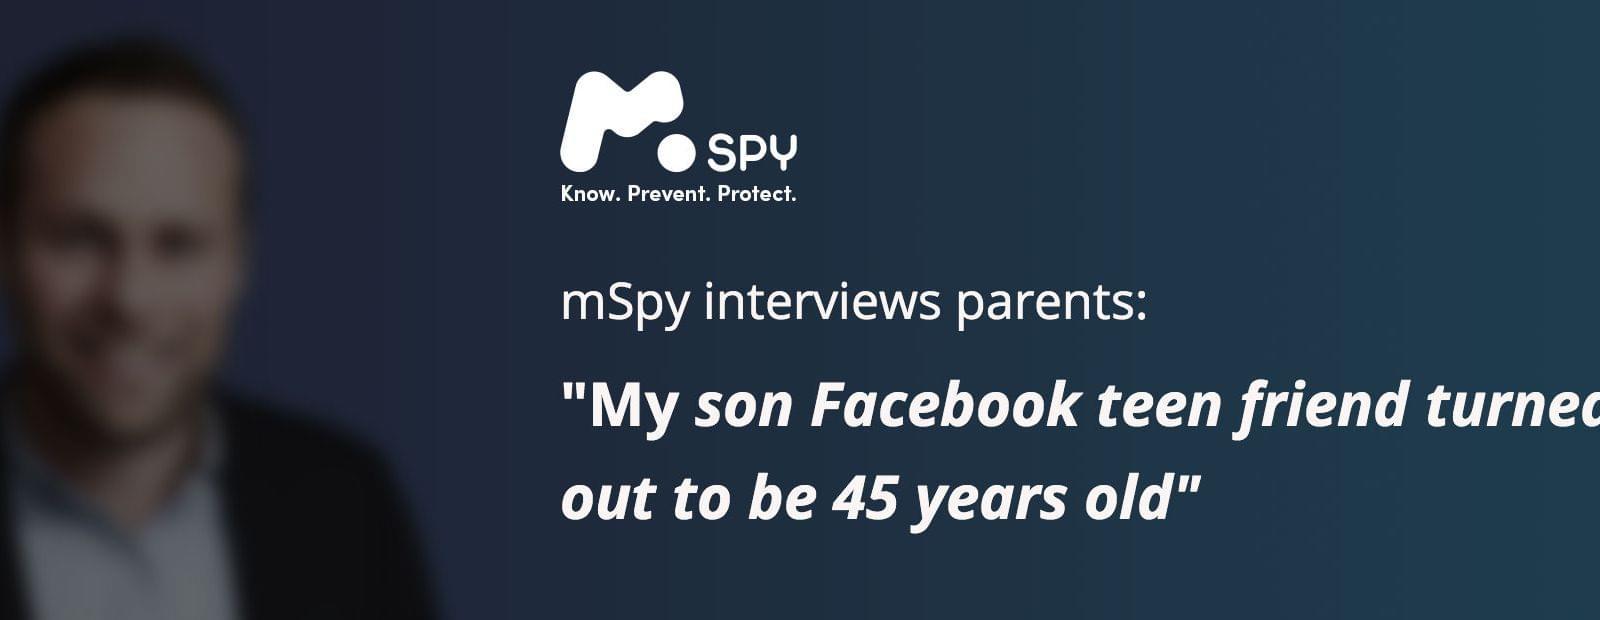 parental control team explains how abusers get into someones facebook